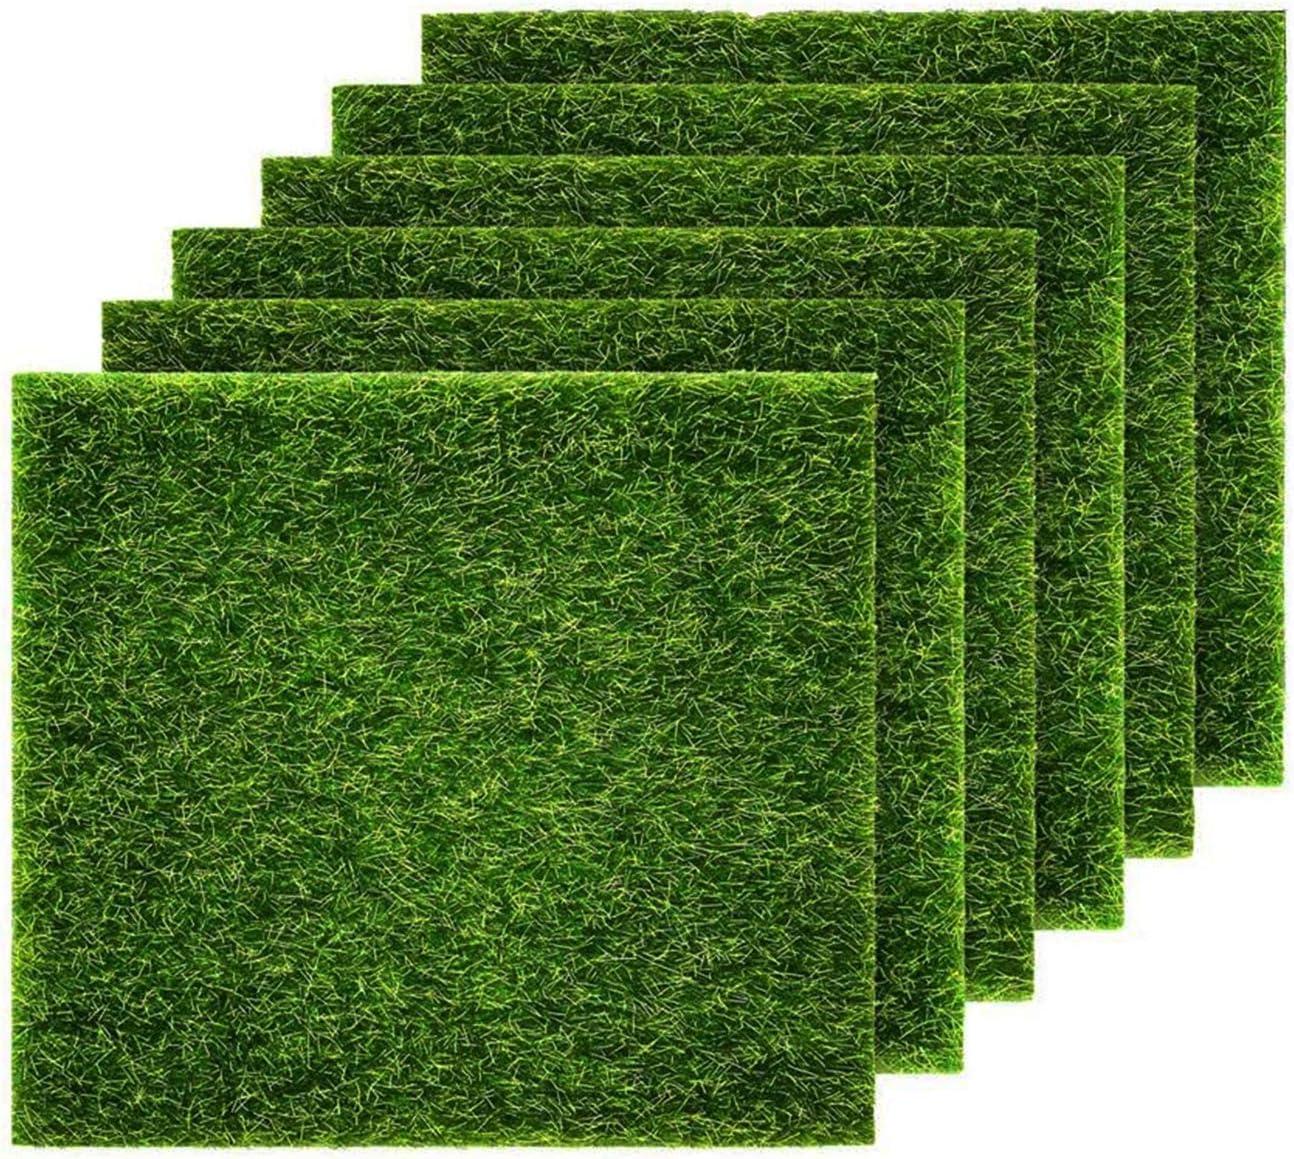 "E.YOMOQGG Artificial Grass Rug, 6 Pcs Artificial Moss Lawn, 6 x 6"" Turf Tile Decoration, Life-Like Fairy Garden Moss for Outdoor Dollhouse Miniature DIY Easter Ornament"